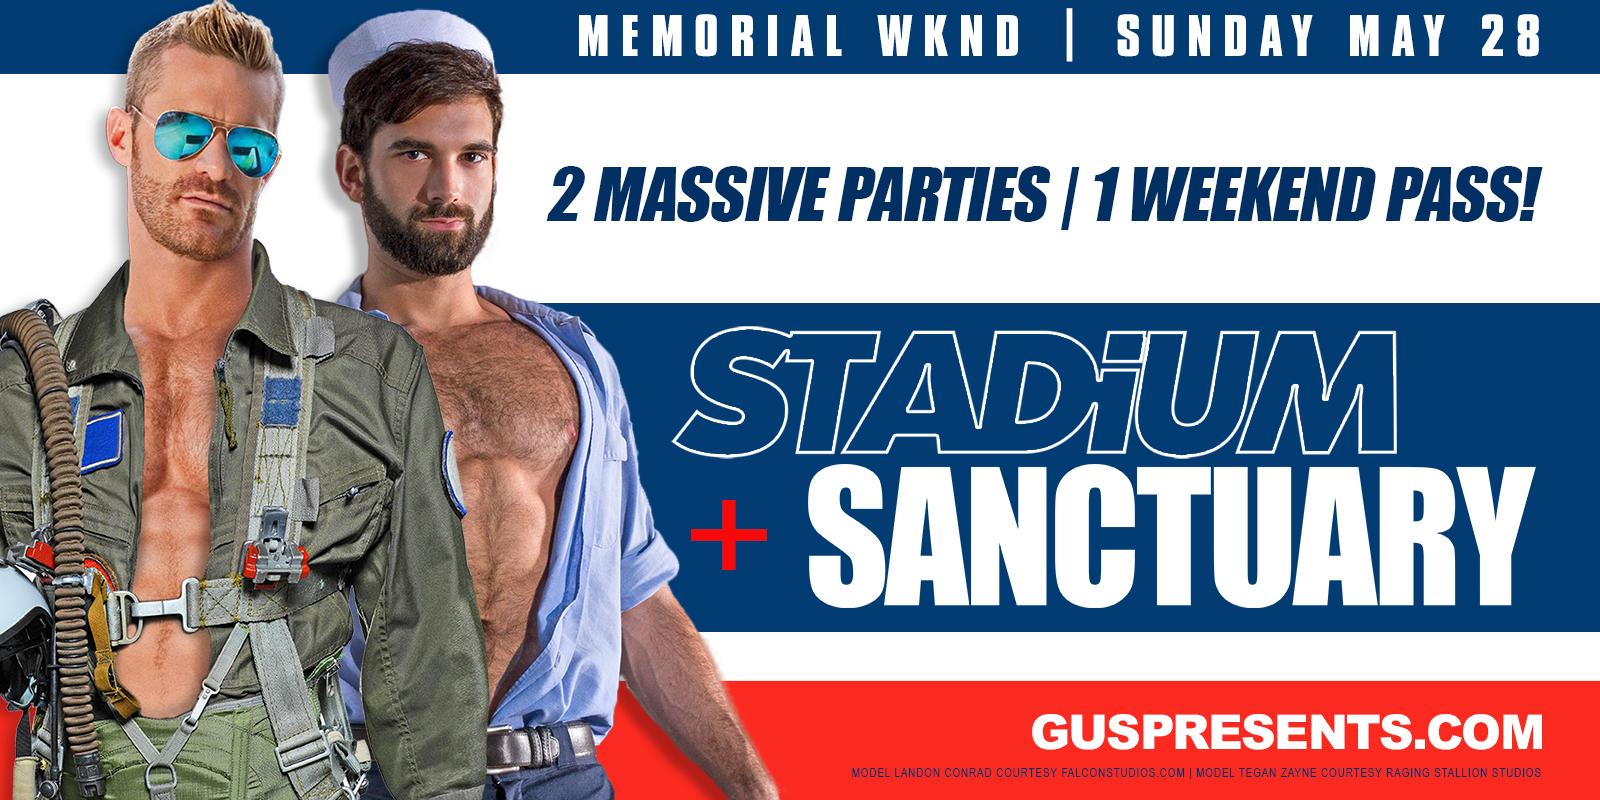 STADiUM + SANCTUARY | 2 PARTY PASS